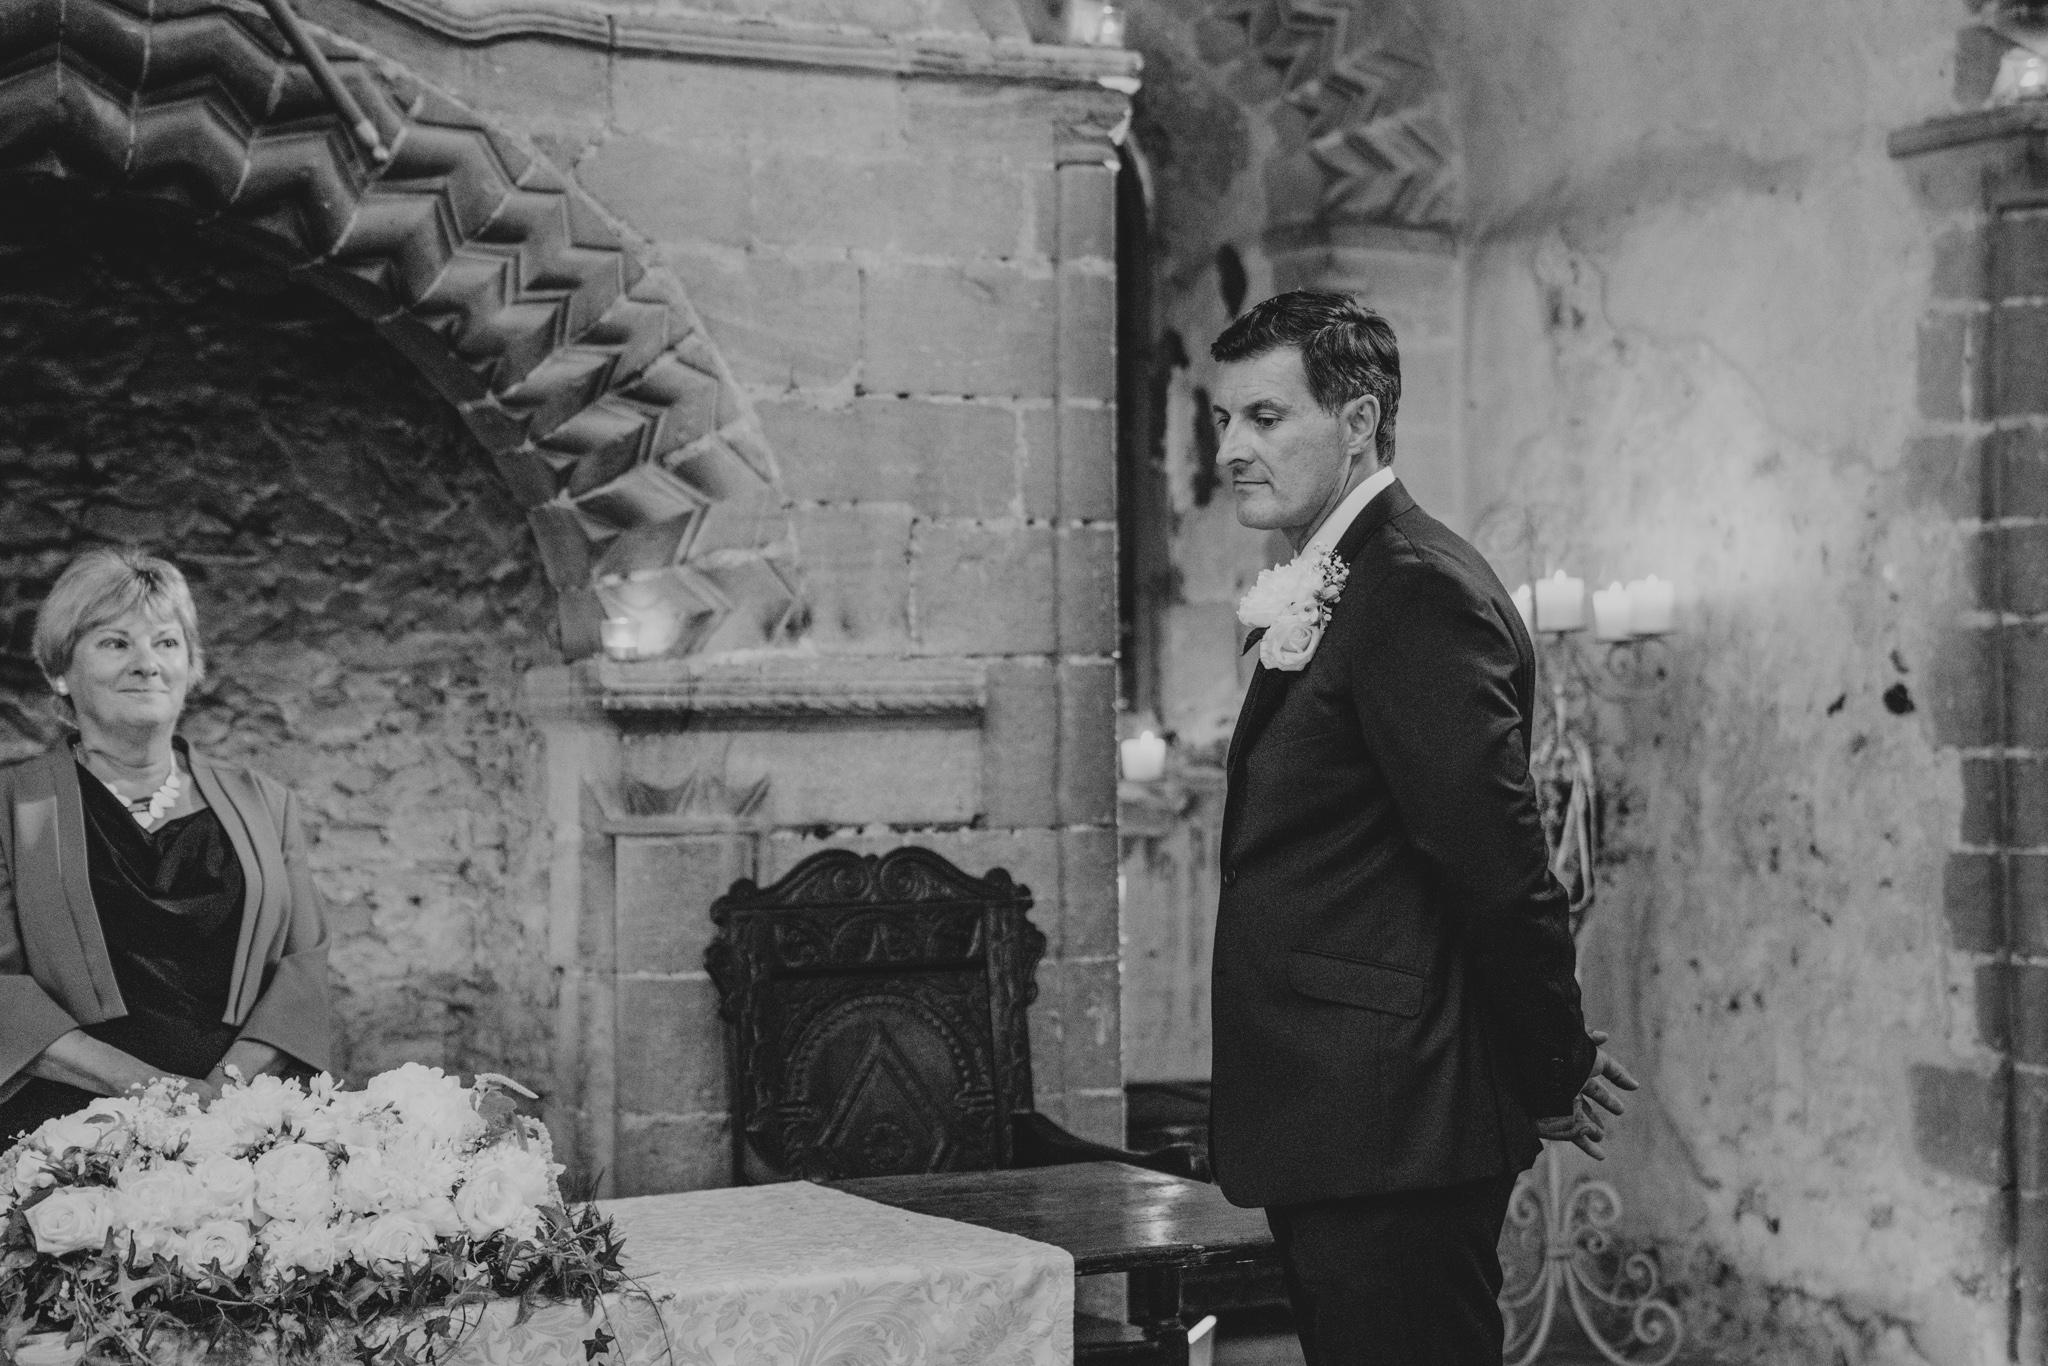 grace-elizabeth-boho-wedding-headingham-castle-essex-wedding-photographer-28.jpg